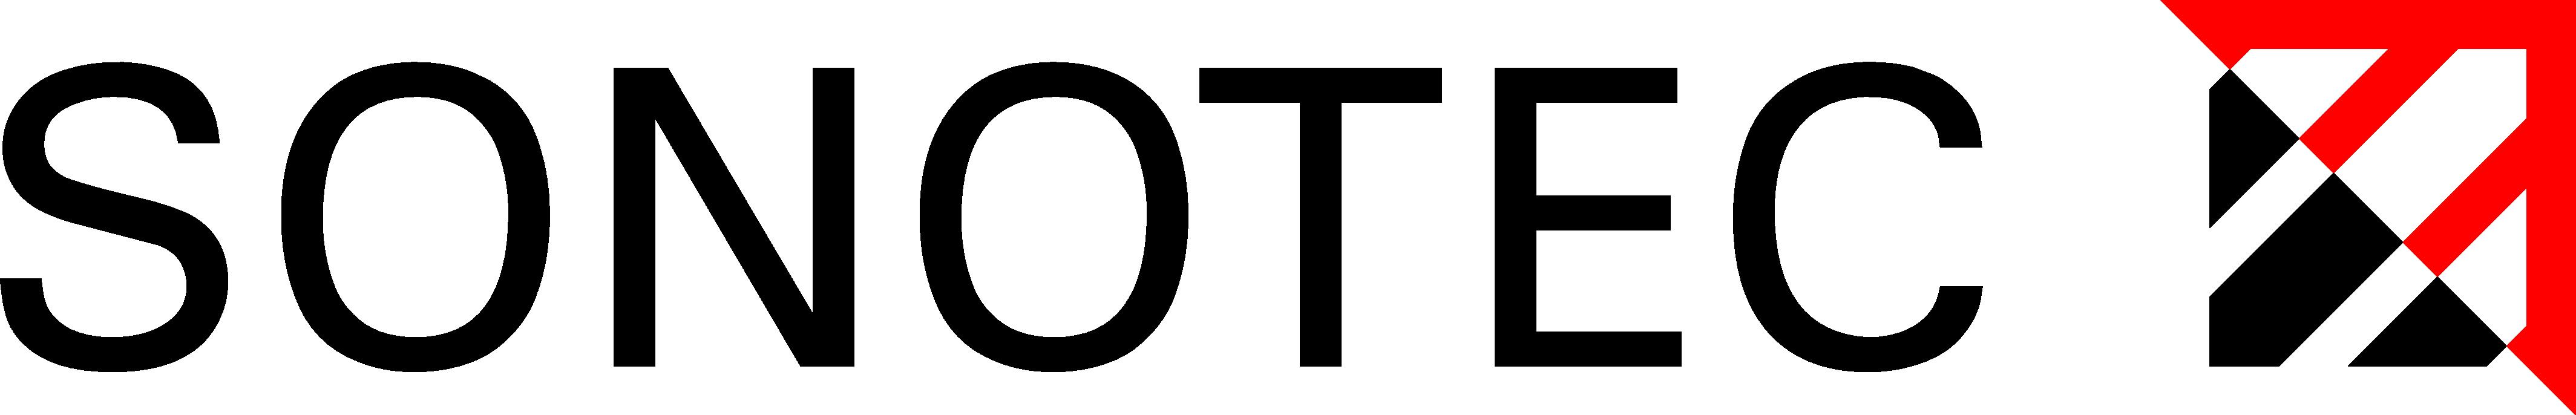 SONOTEC Ultraschallsenorik Halle GmbH